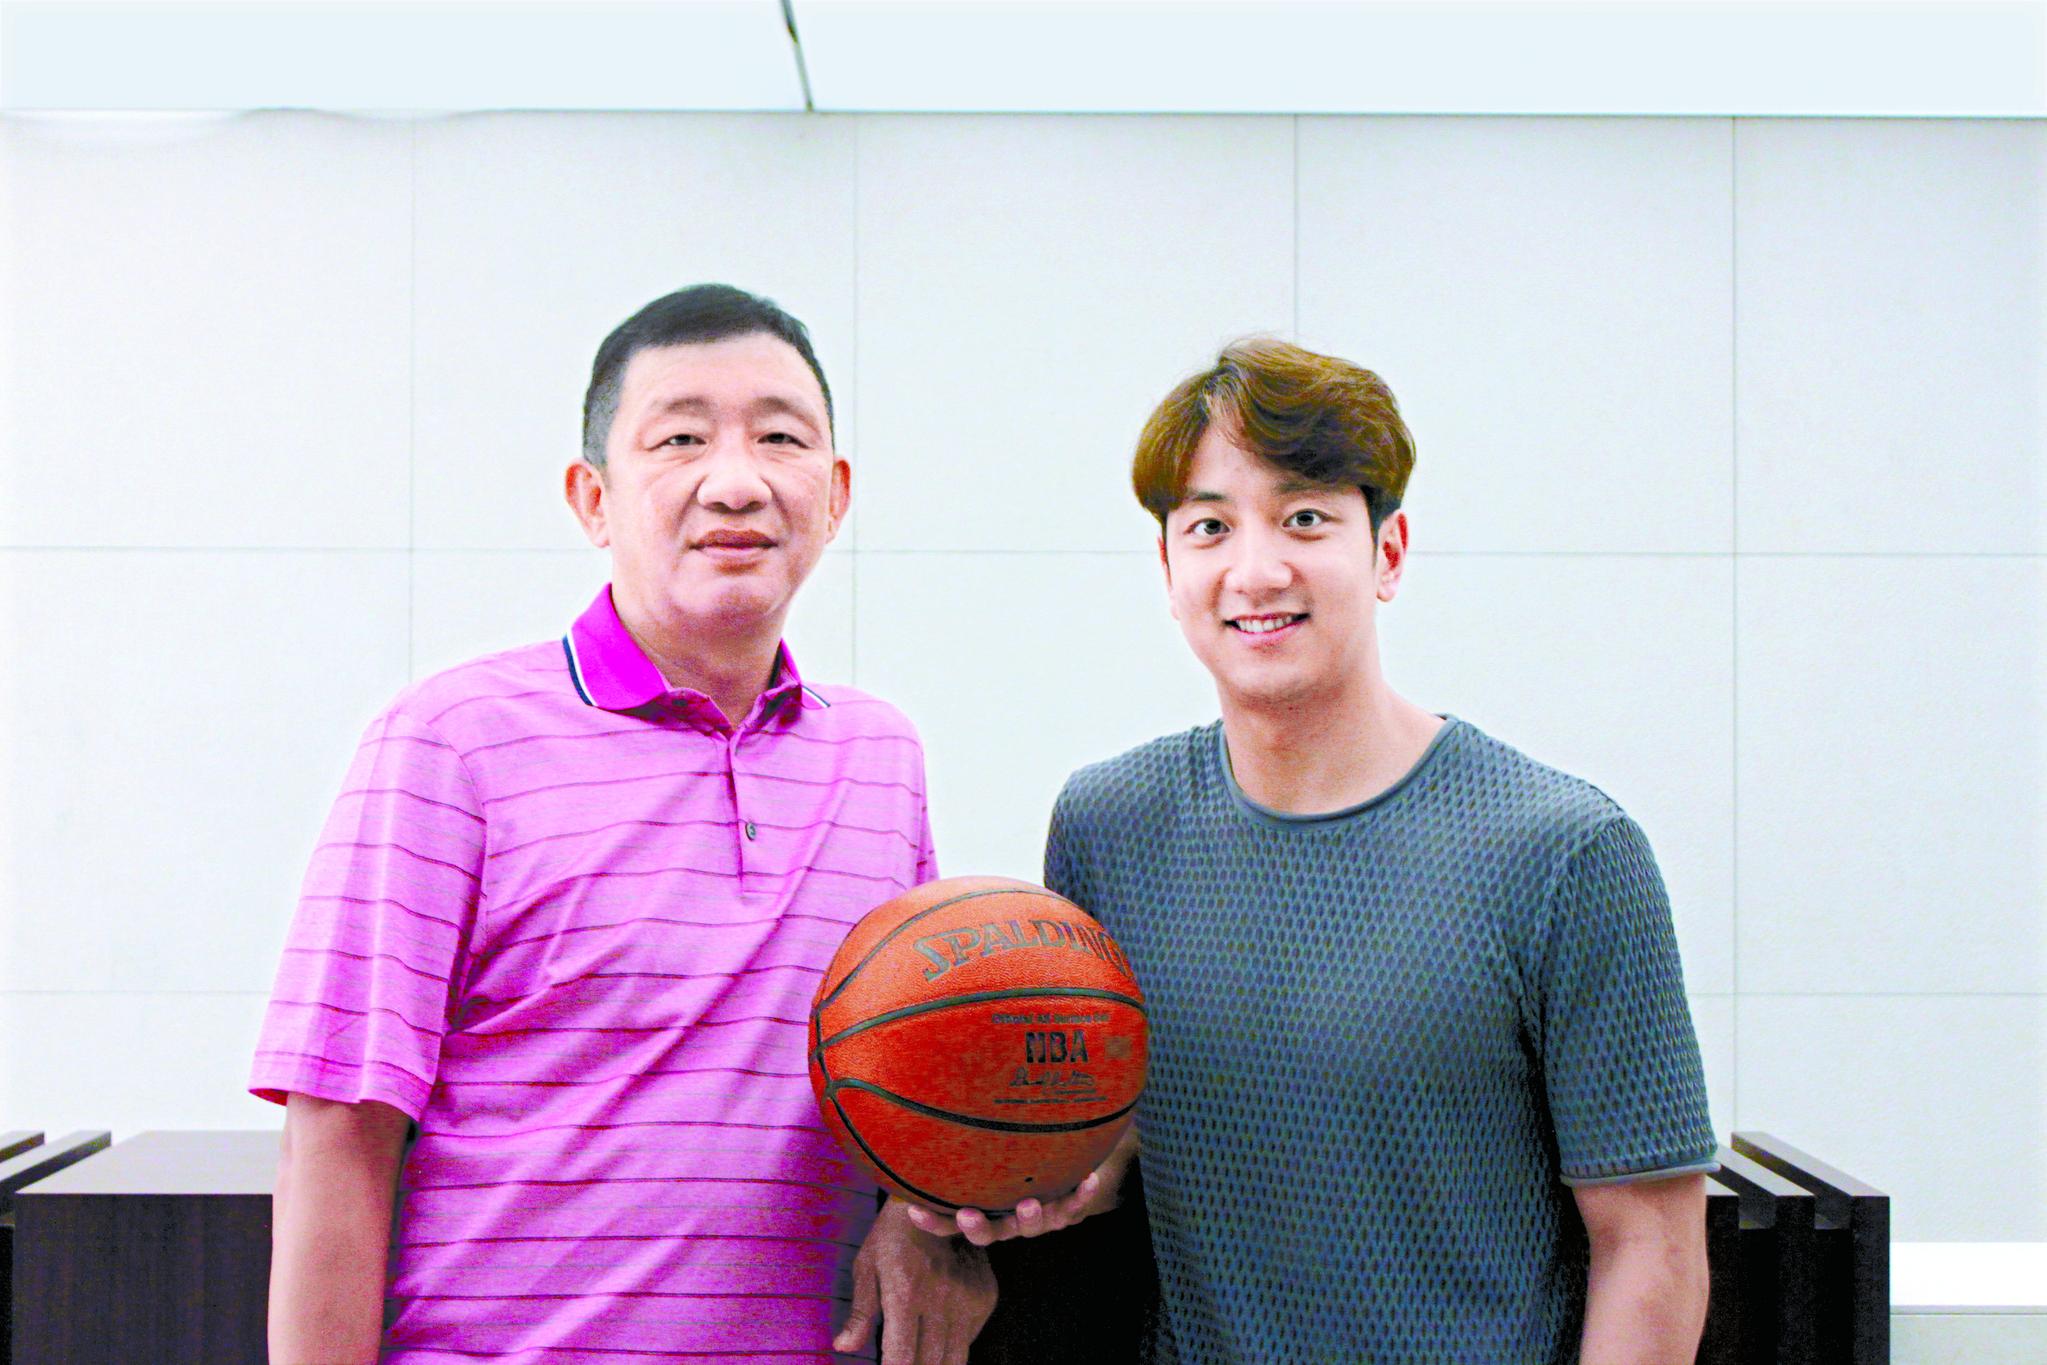 TV 예능 프로그램에서 맹활약 중인 허재(왼쪽) 전 국가대표팀 감독과 농구 월드컵에 처음 출전하는 그의 차남 허훈. 박린 기자